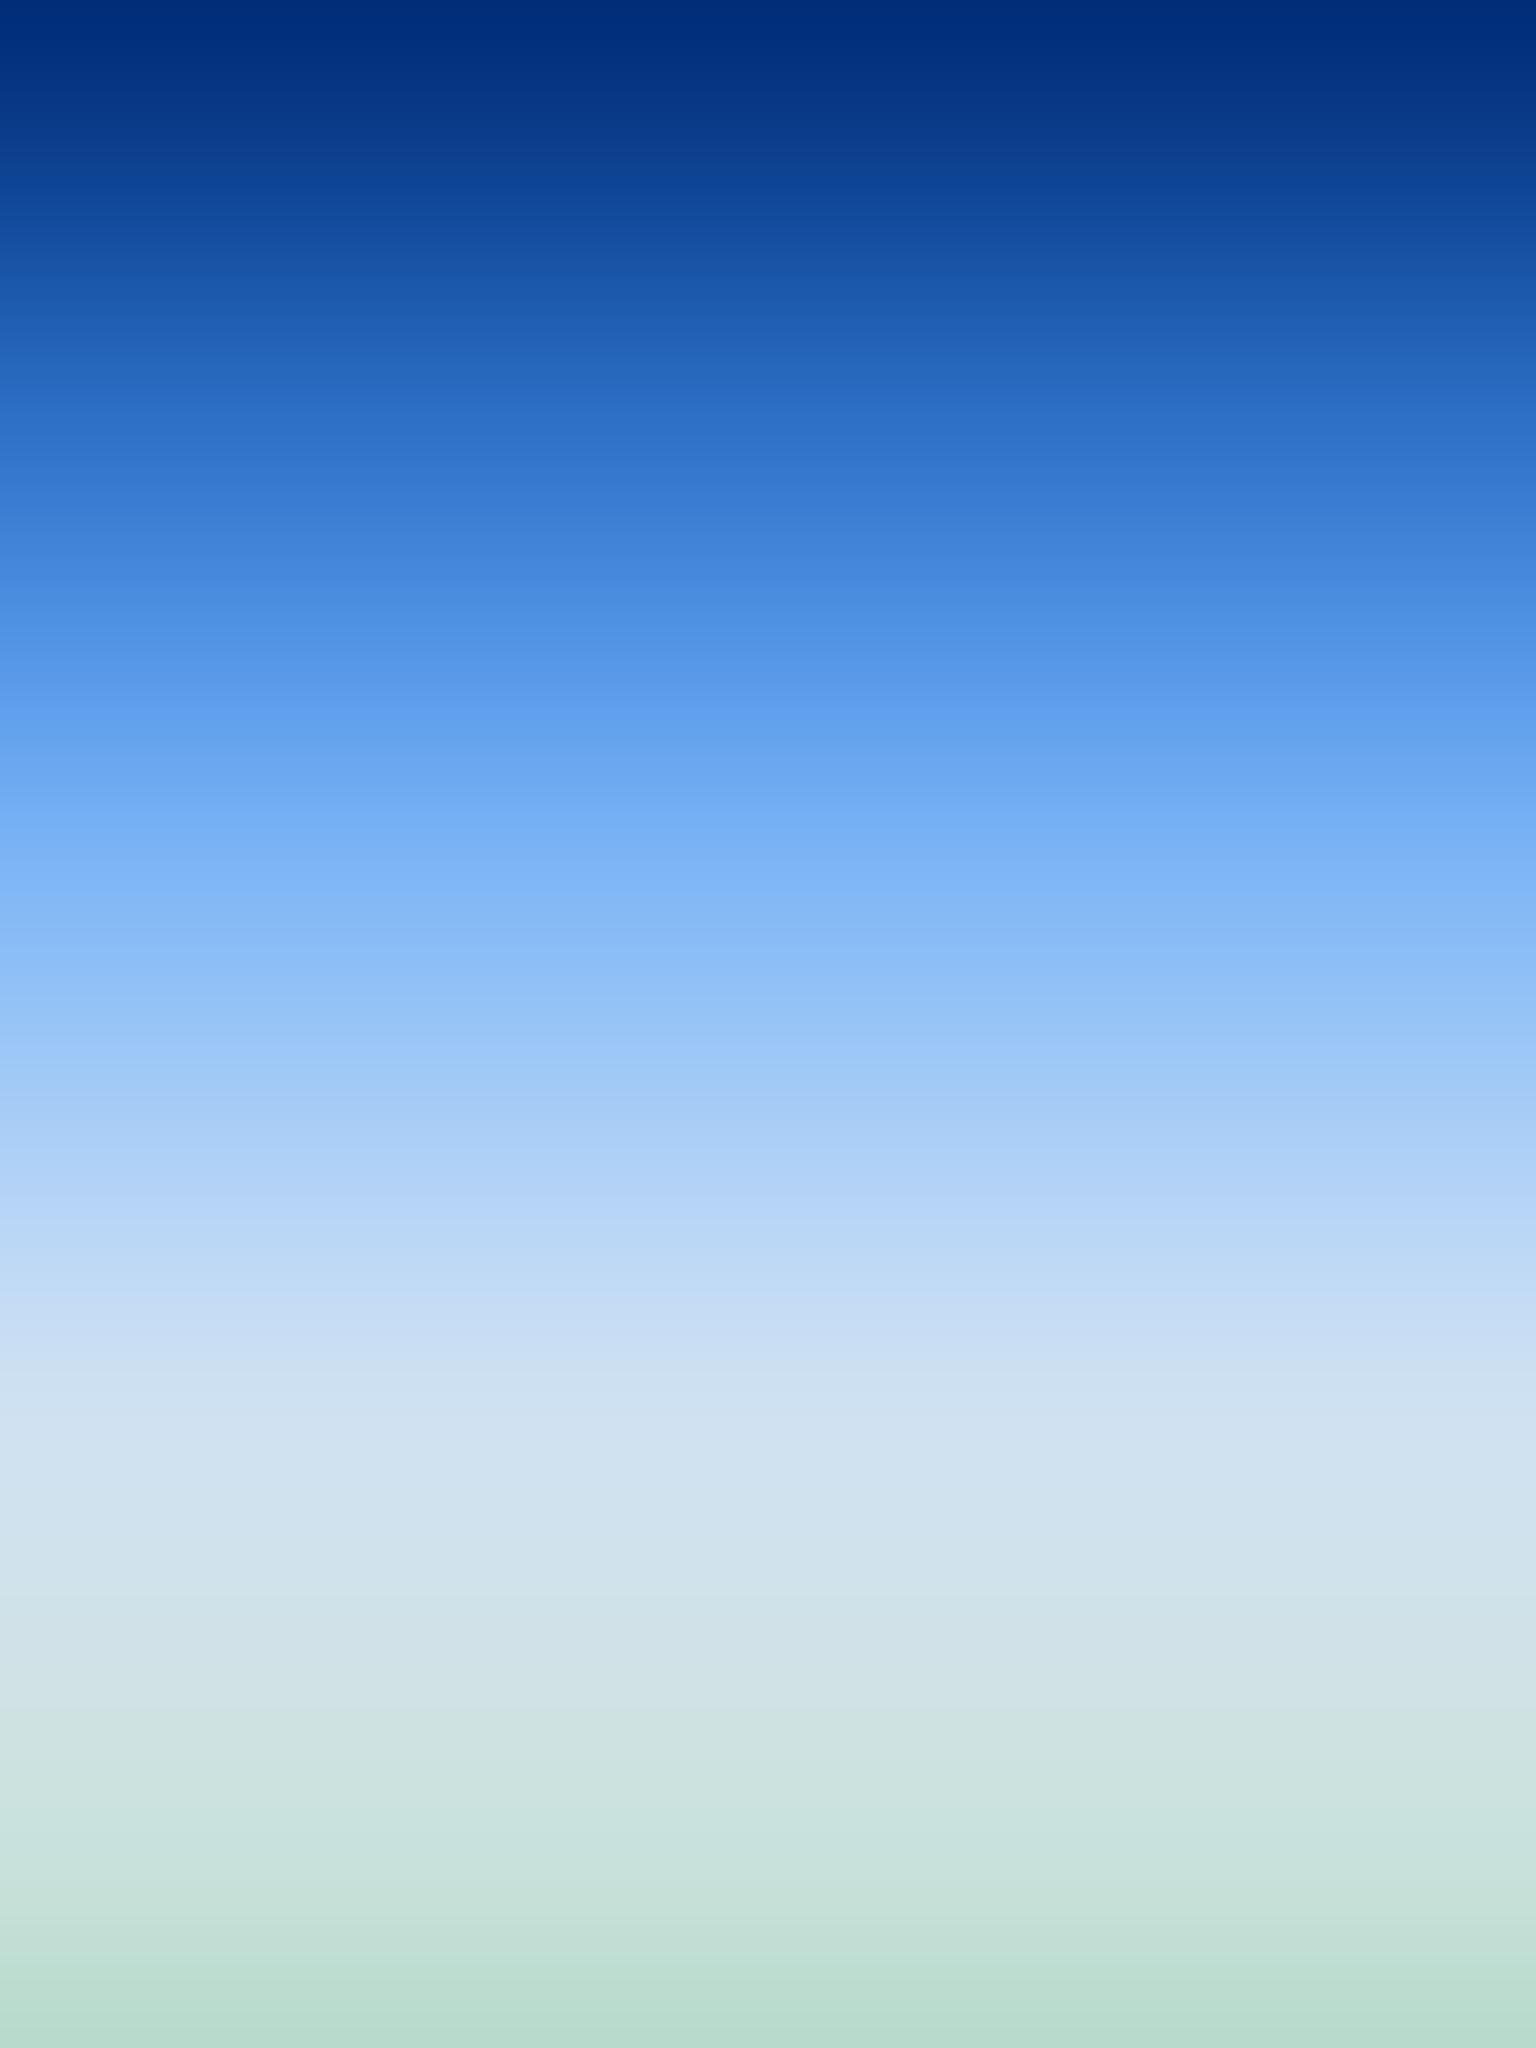 iPad Air wallpaper for iPad